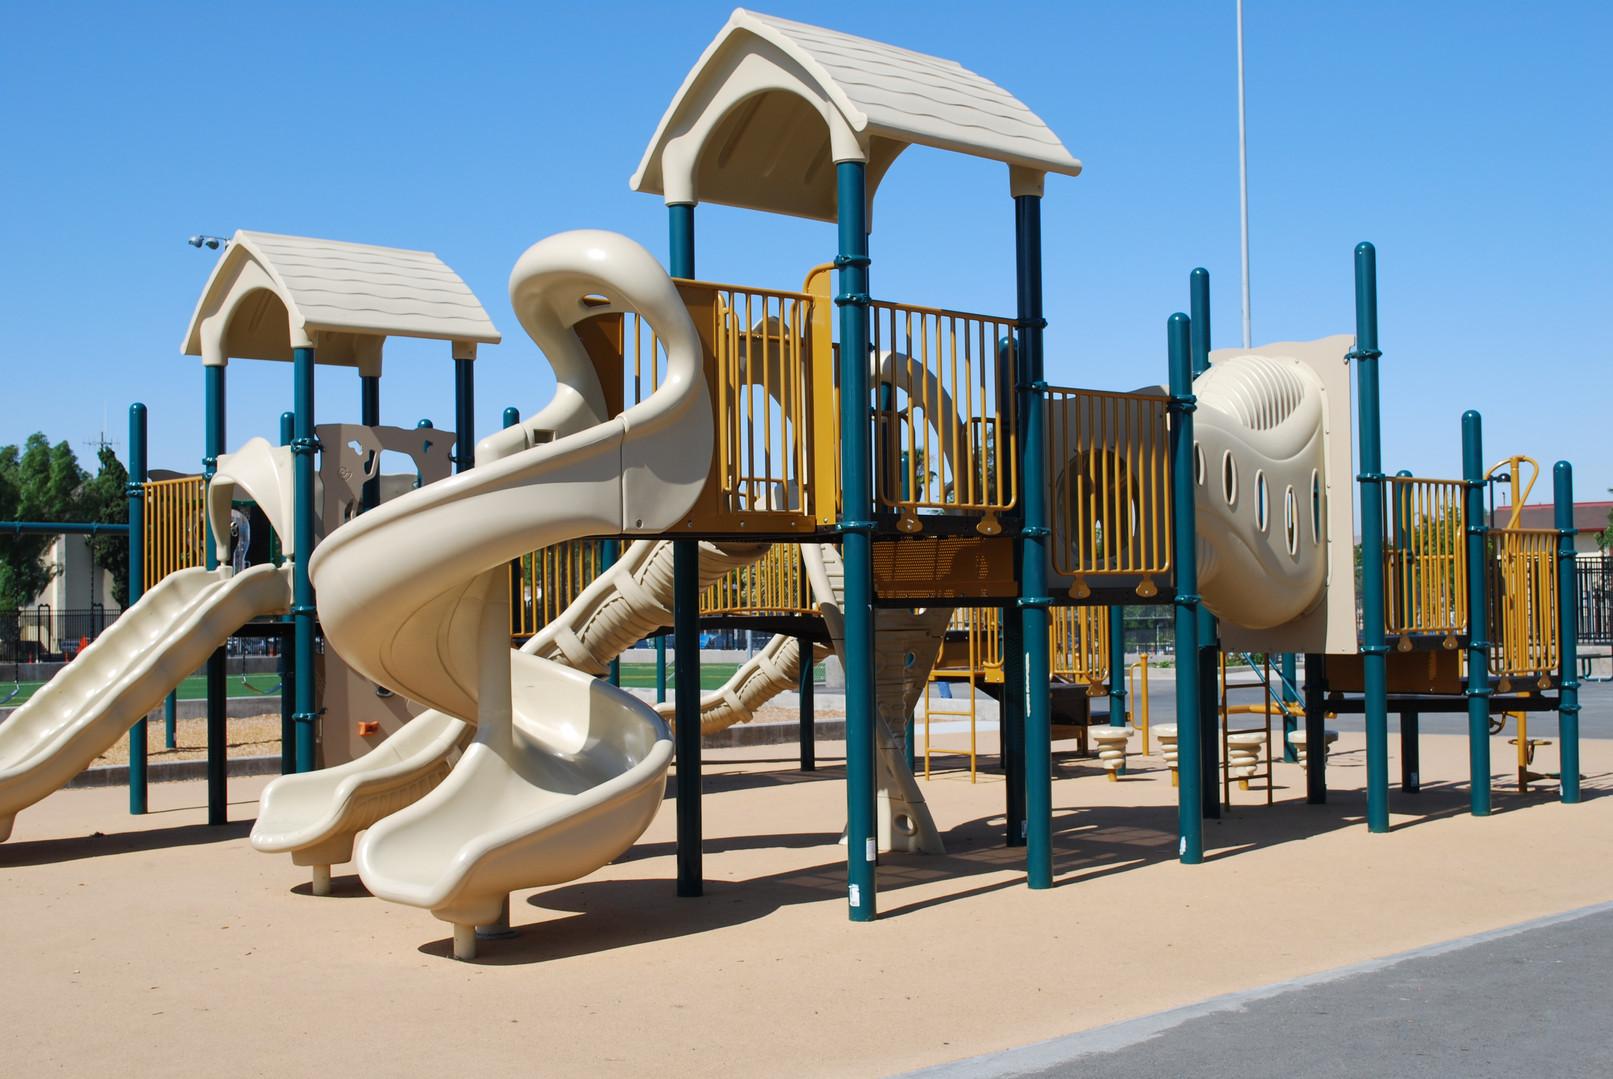 Marina Elementary School Playground